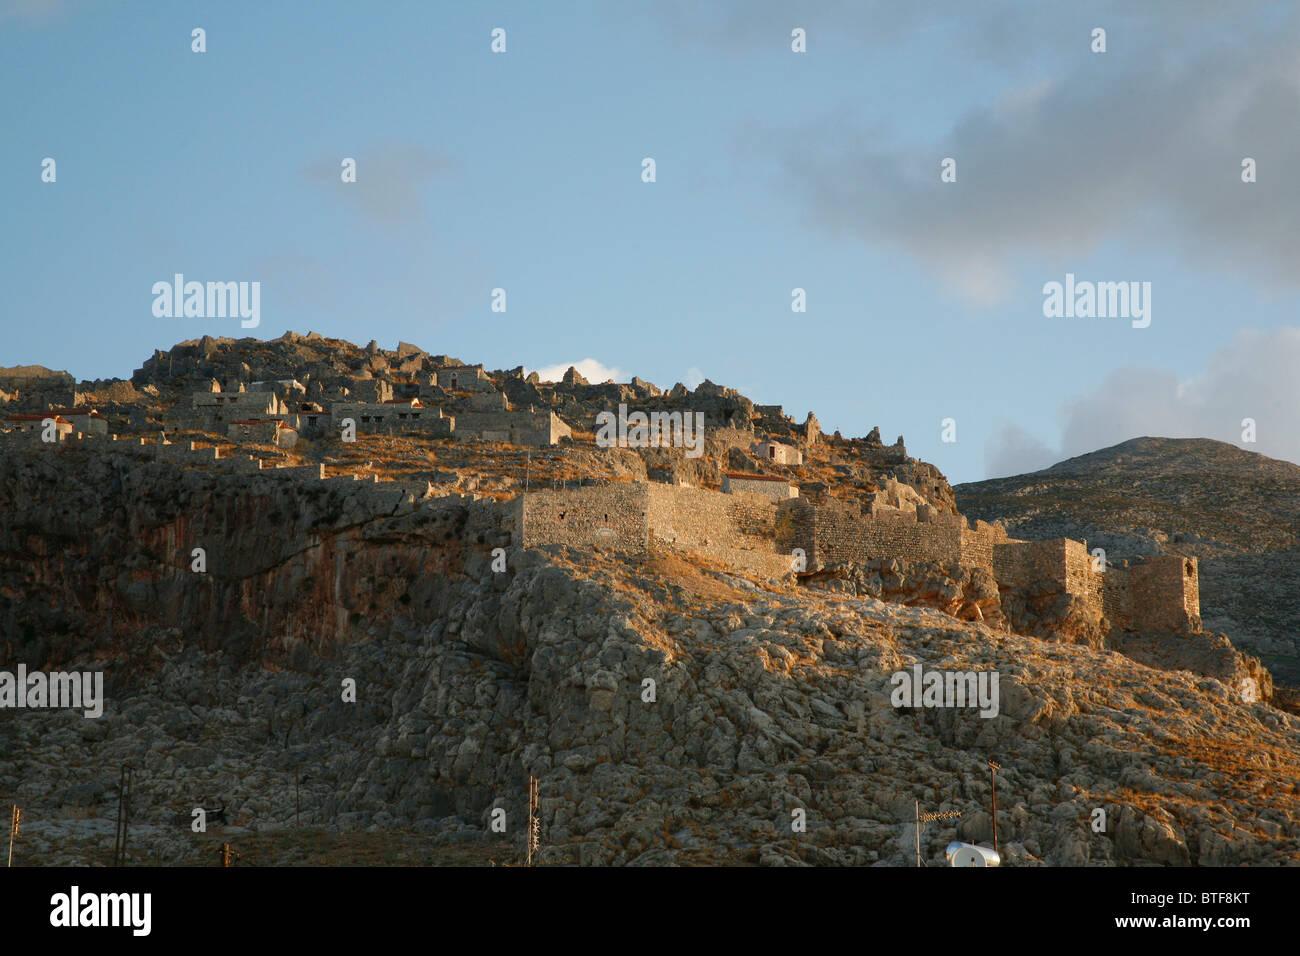 Pera Kastro Castle, Horio, Kalymnos, Greece. - Stock Image